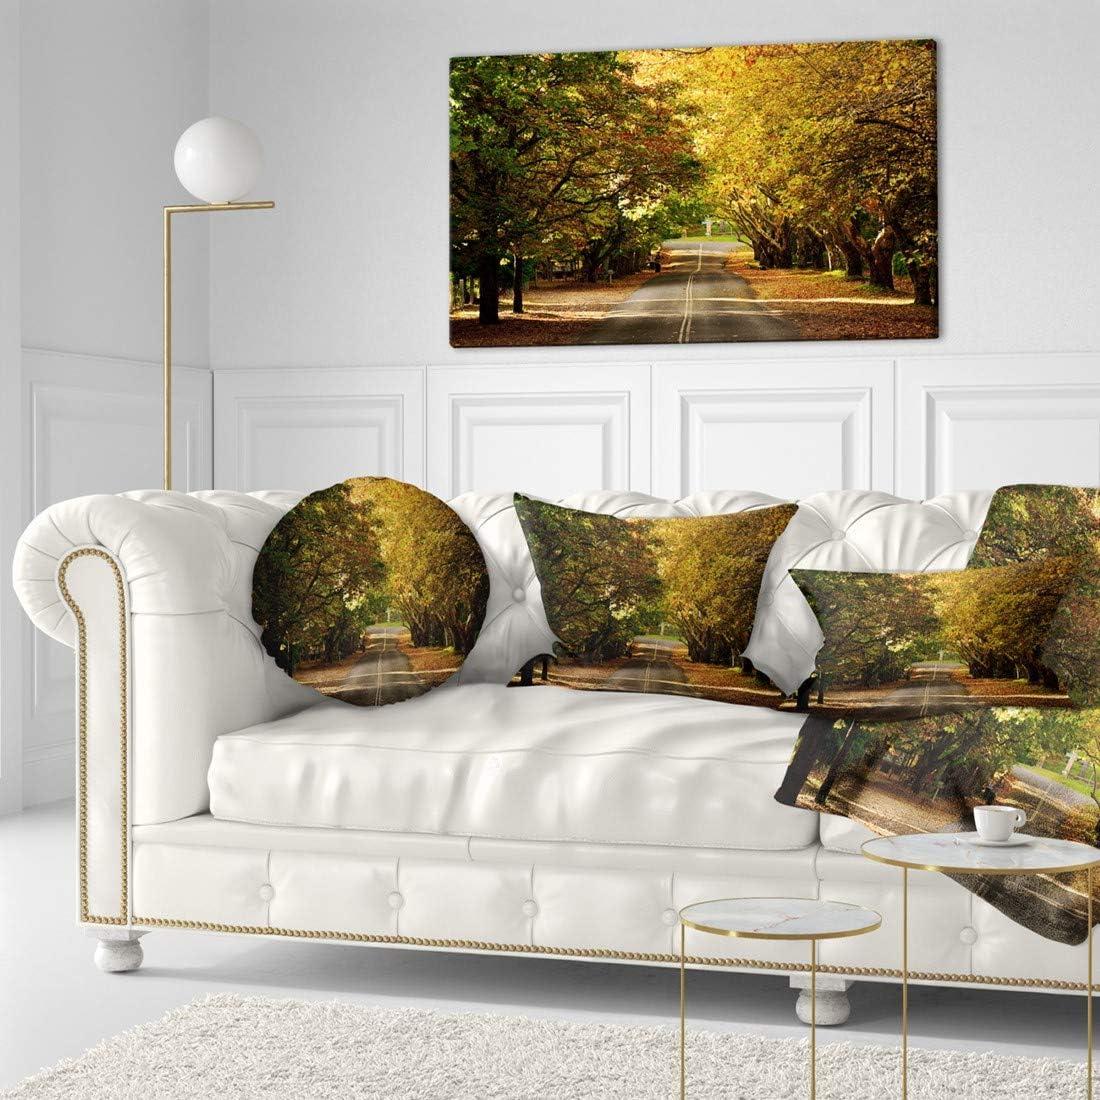 Design Art PT10231-40-20 ついに入荷 Road Through Trees-Land 男女兼用 Beautiful Green